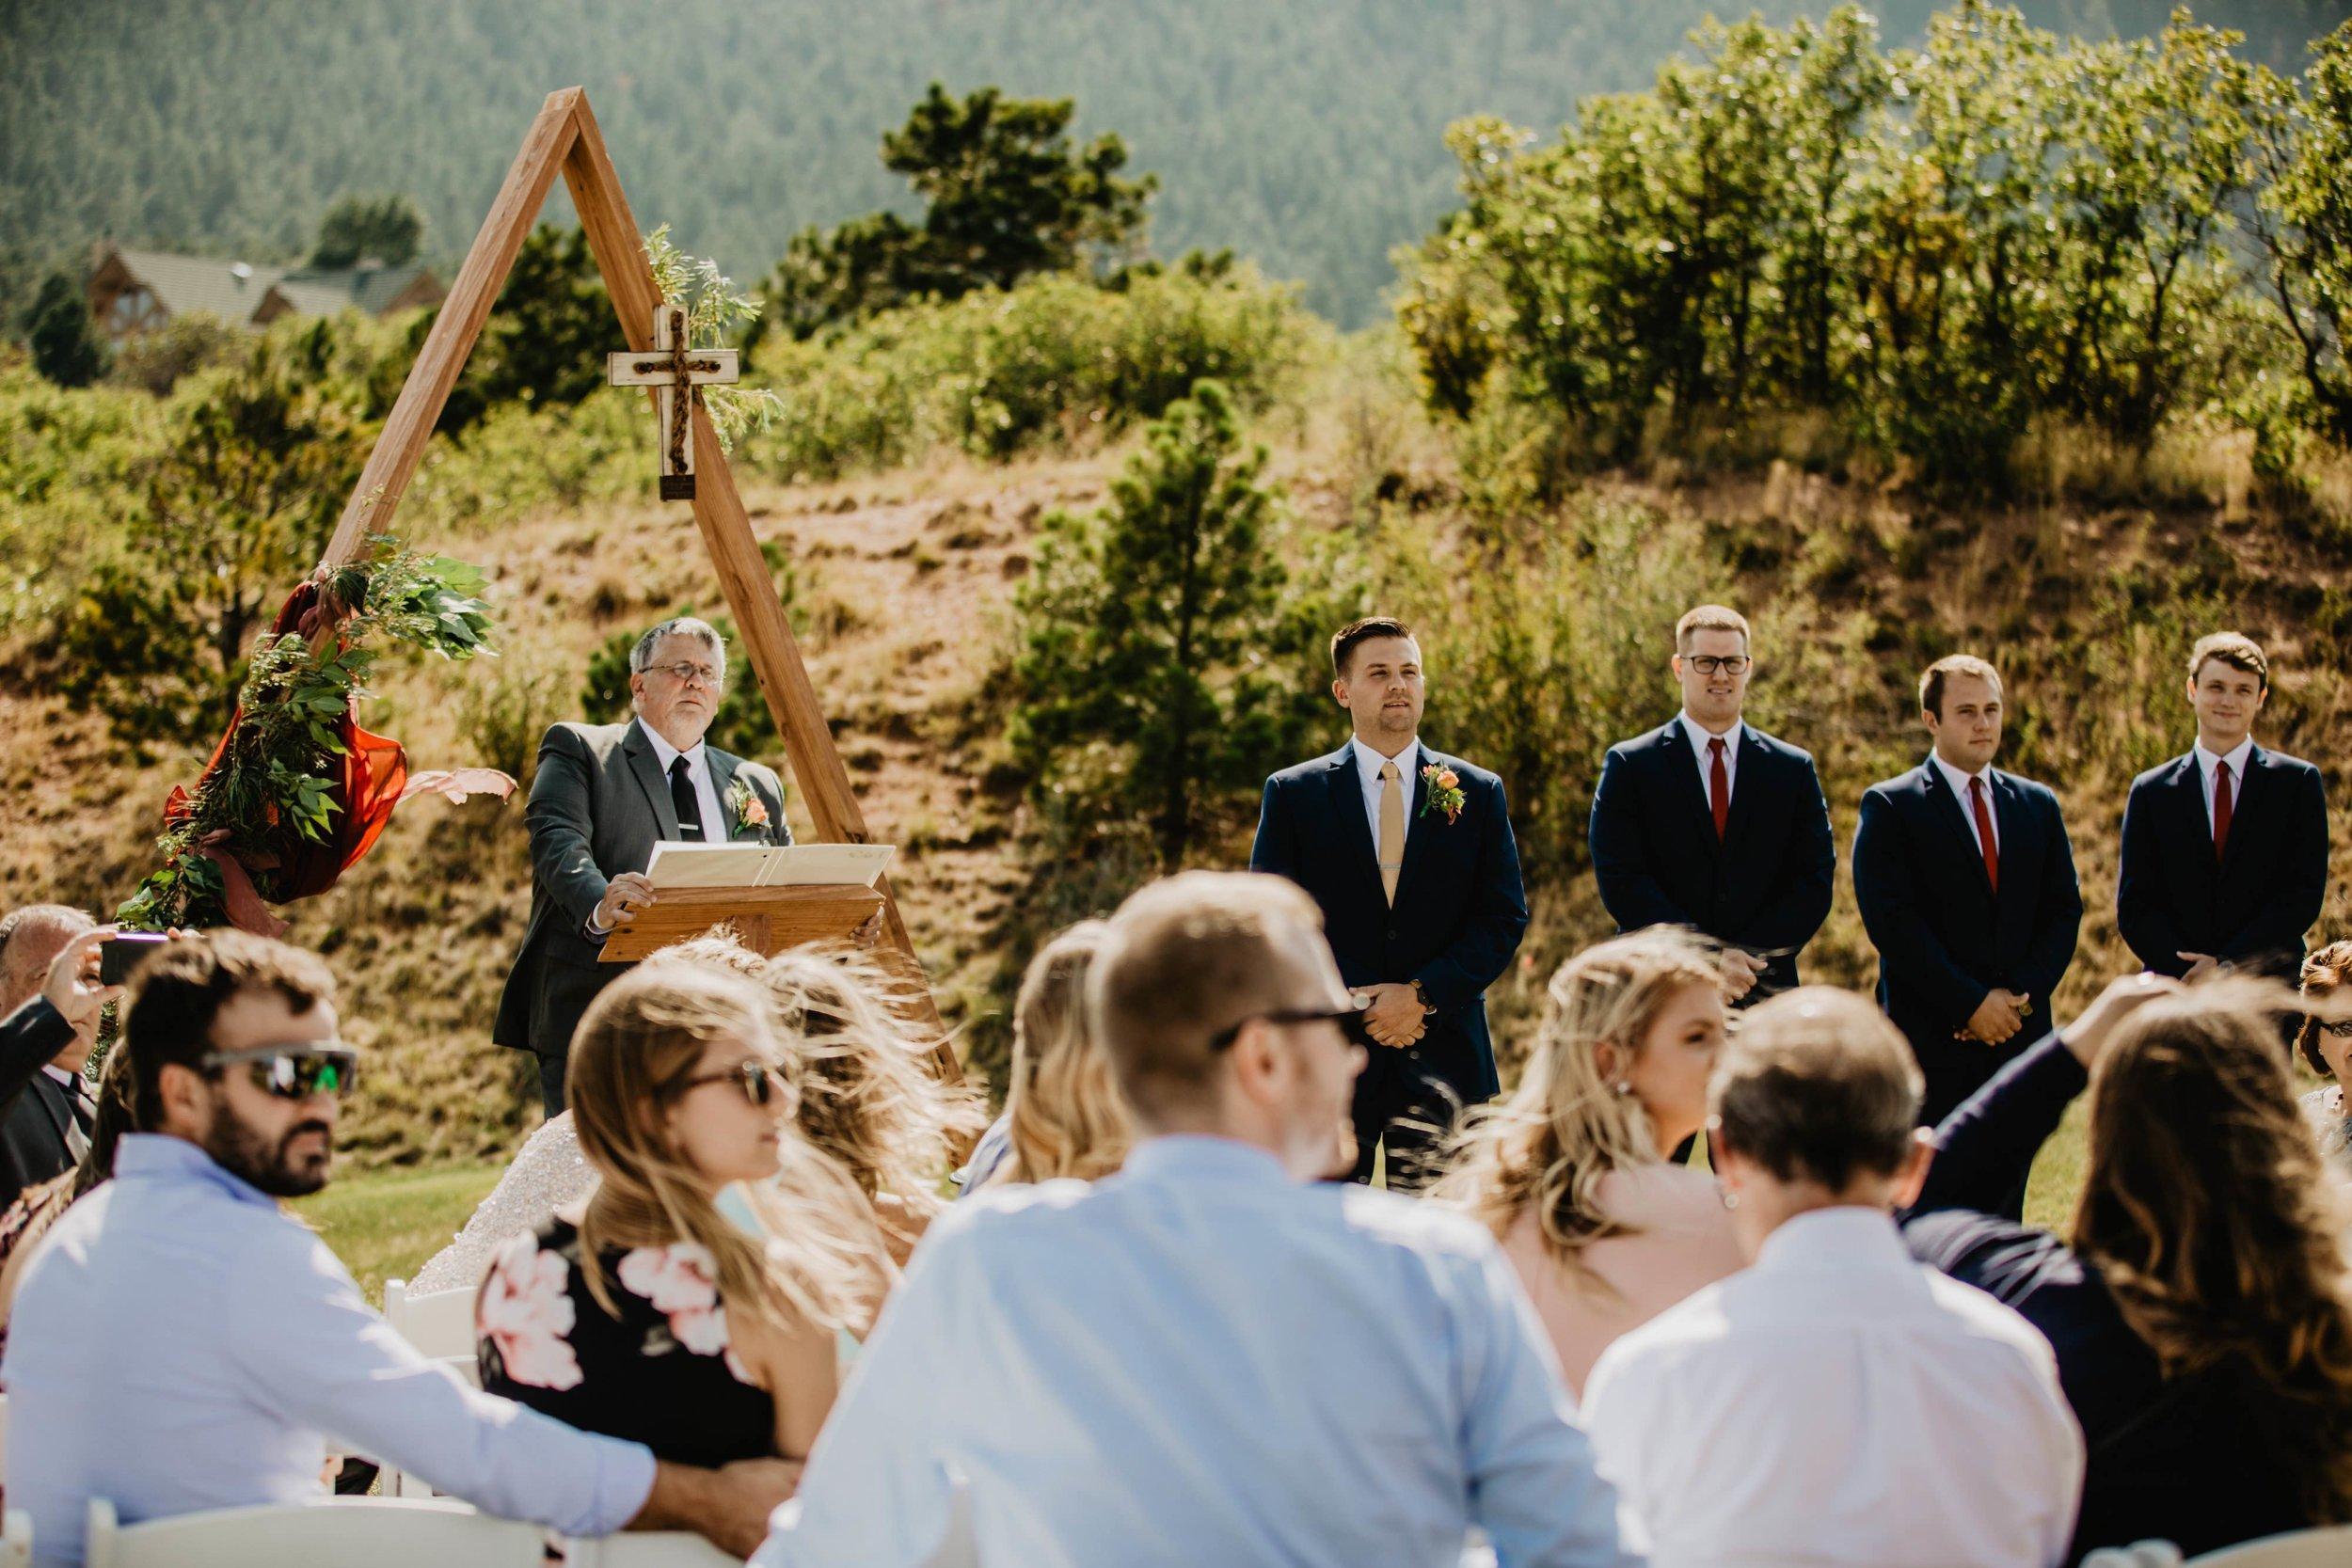 Kisa Conrad Favorites-0005-colorado-wedding-photographer-denver-springs-vail.jpeg